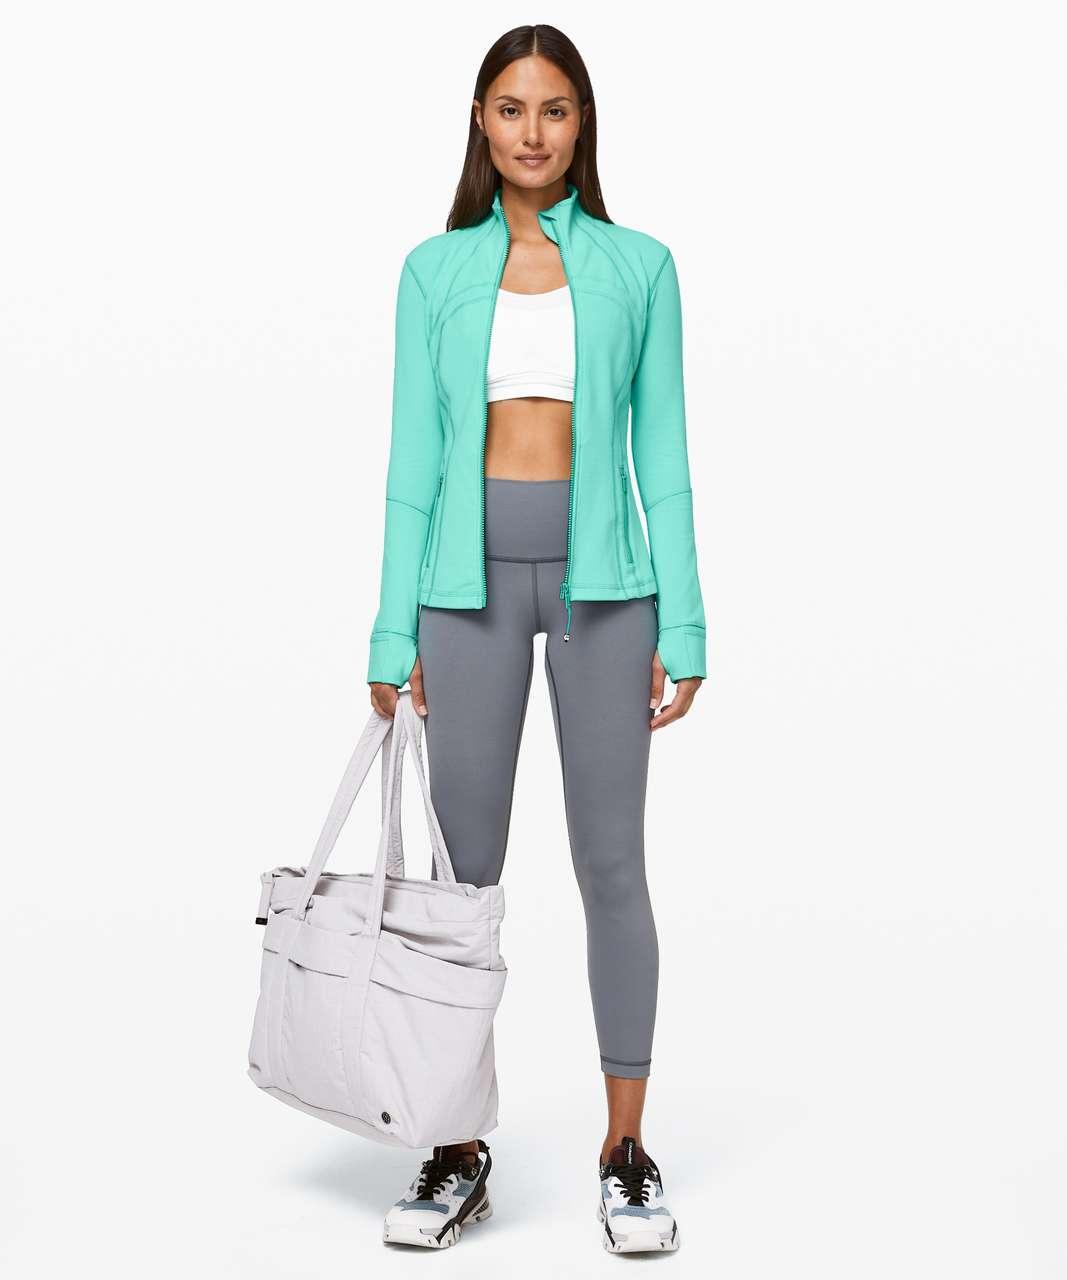 Lululemon Define Jacket - Bali Breeze